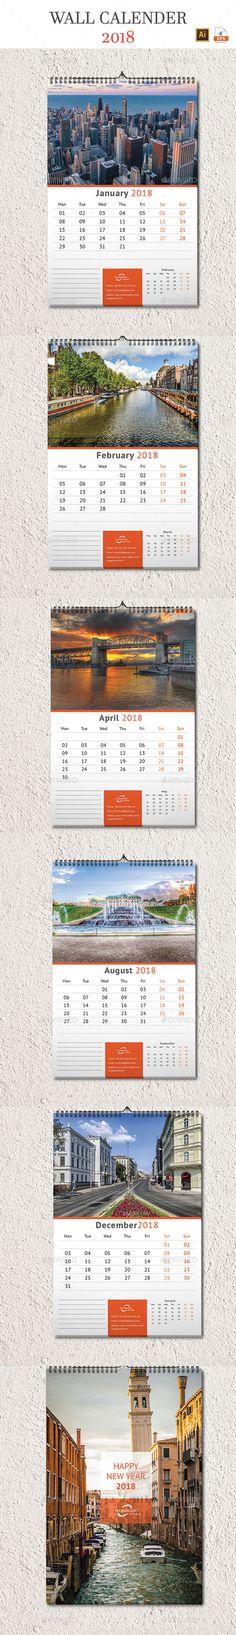 Wall Calendar   Calendar  Walls And Calendar Design